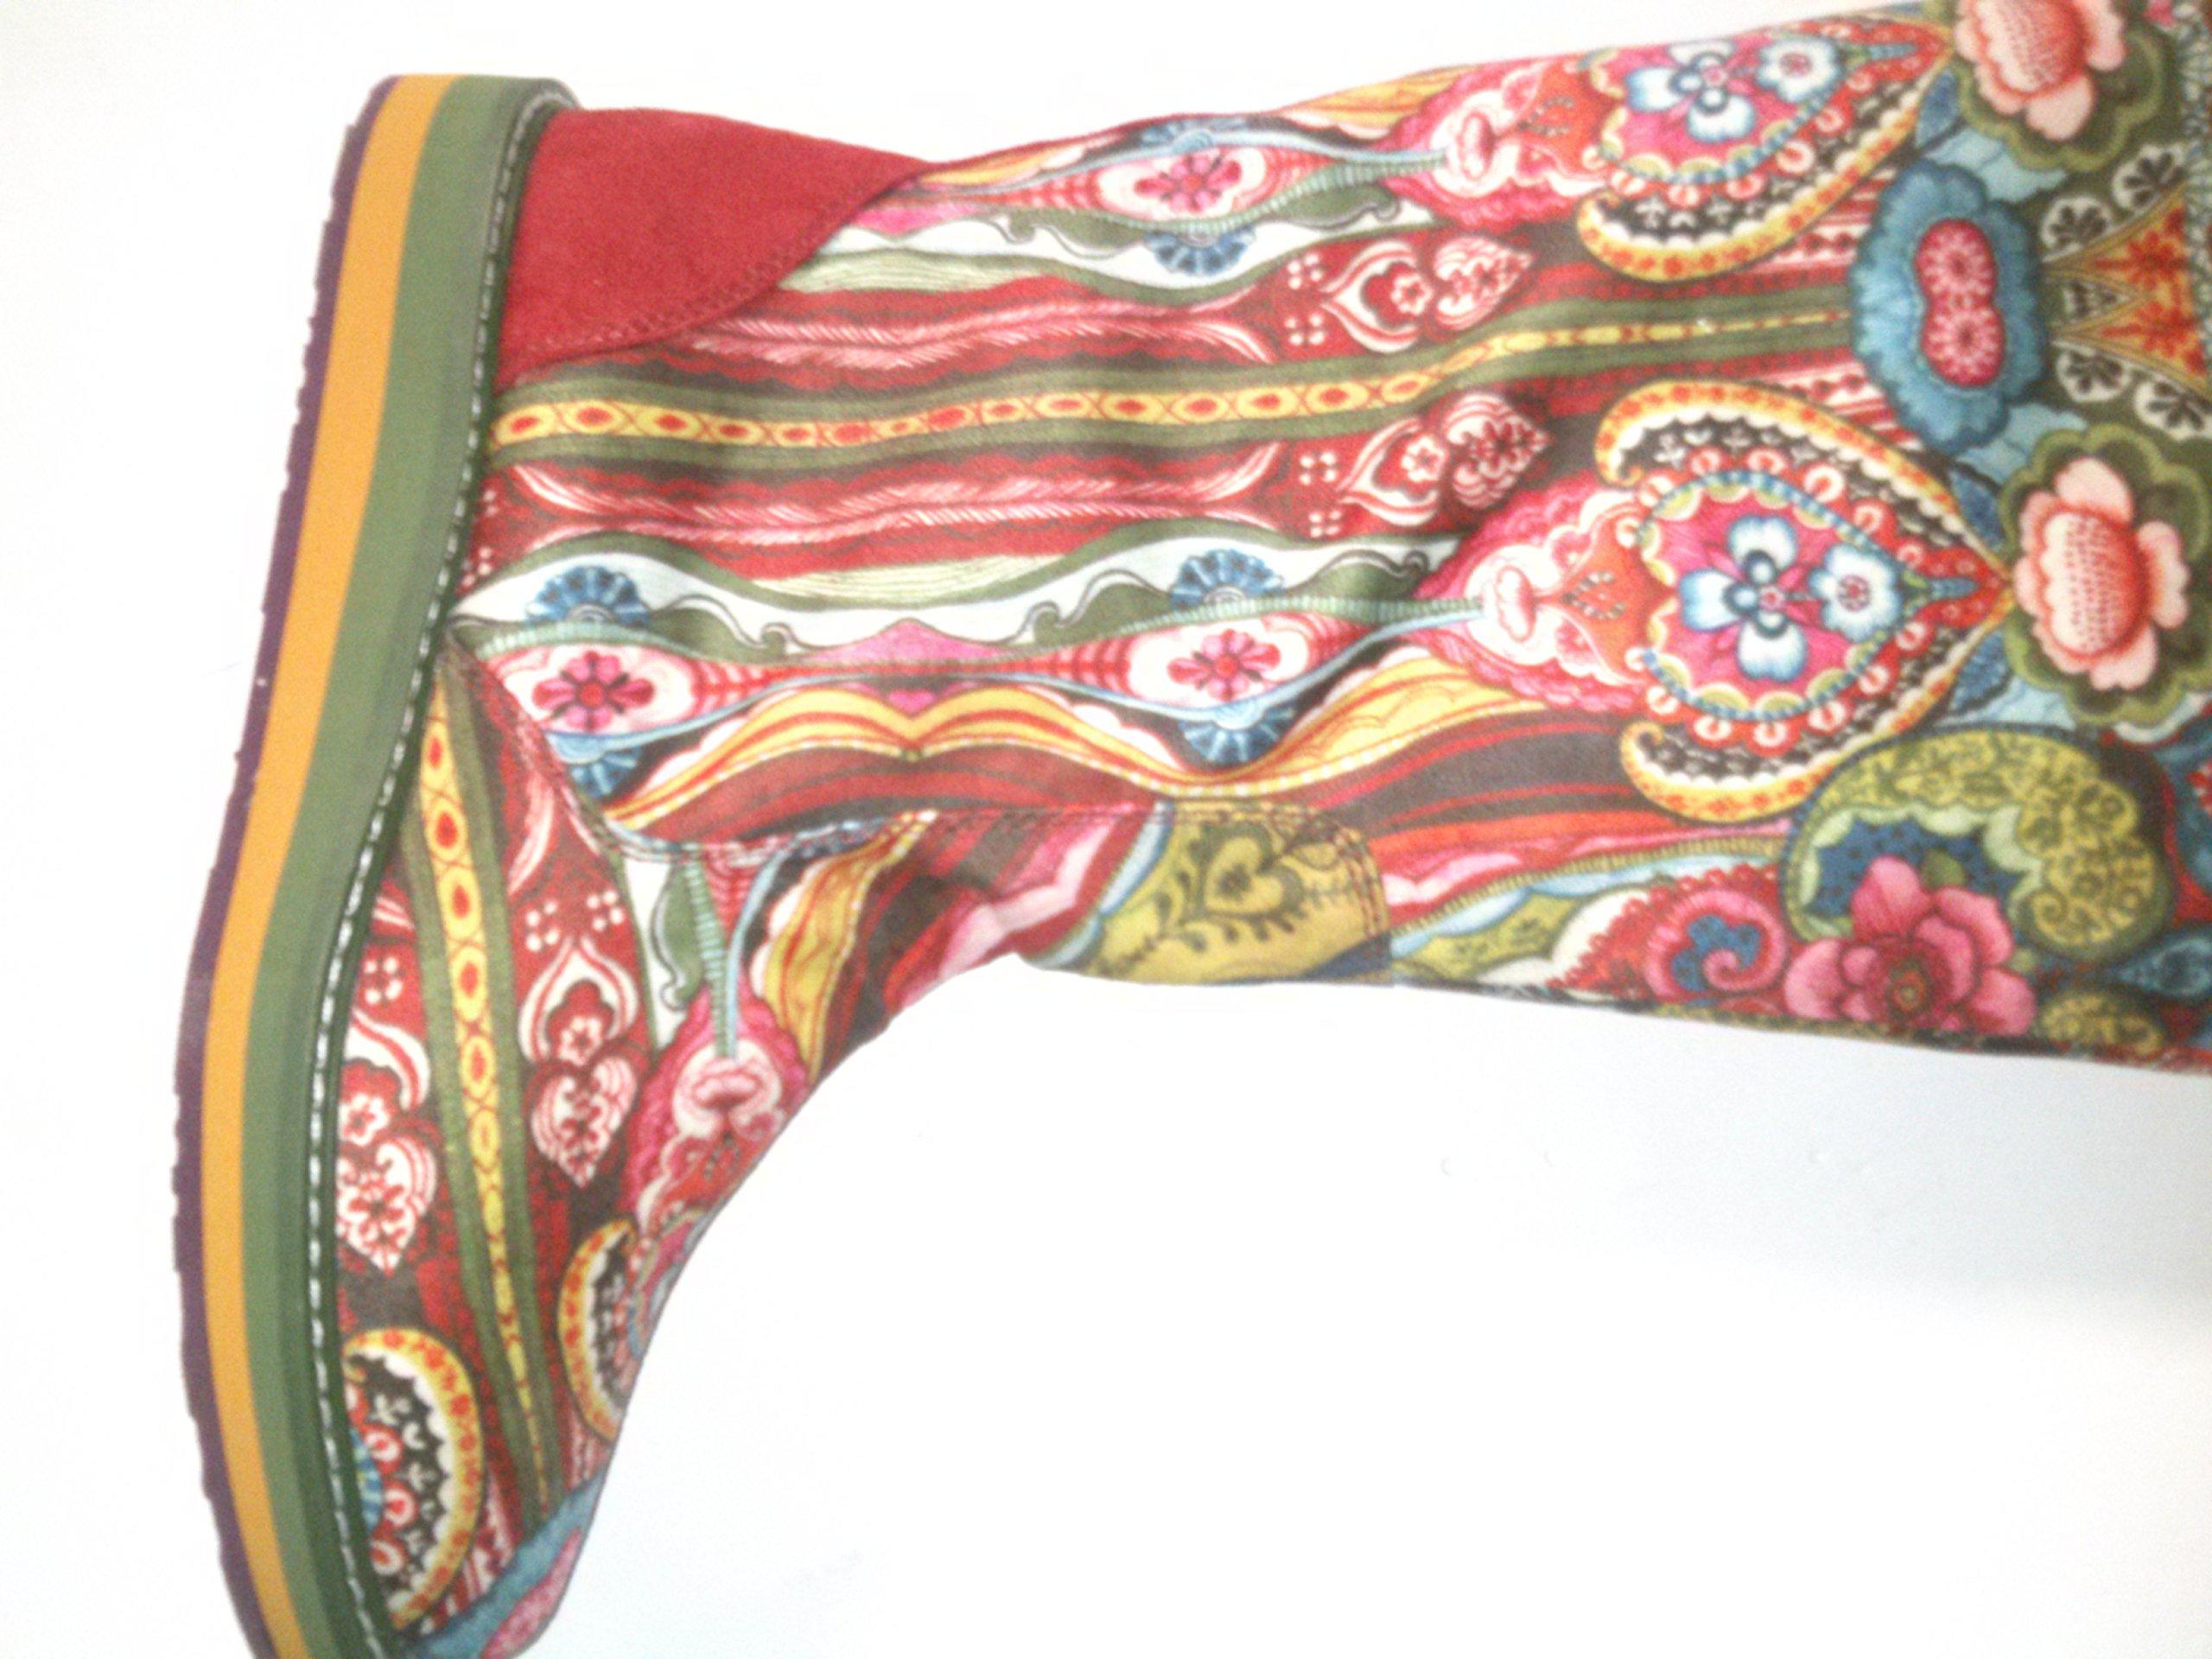 Desigual Shoe Boots Alicante 28TS382 Size US 7 EU 38